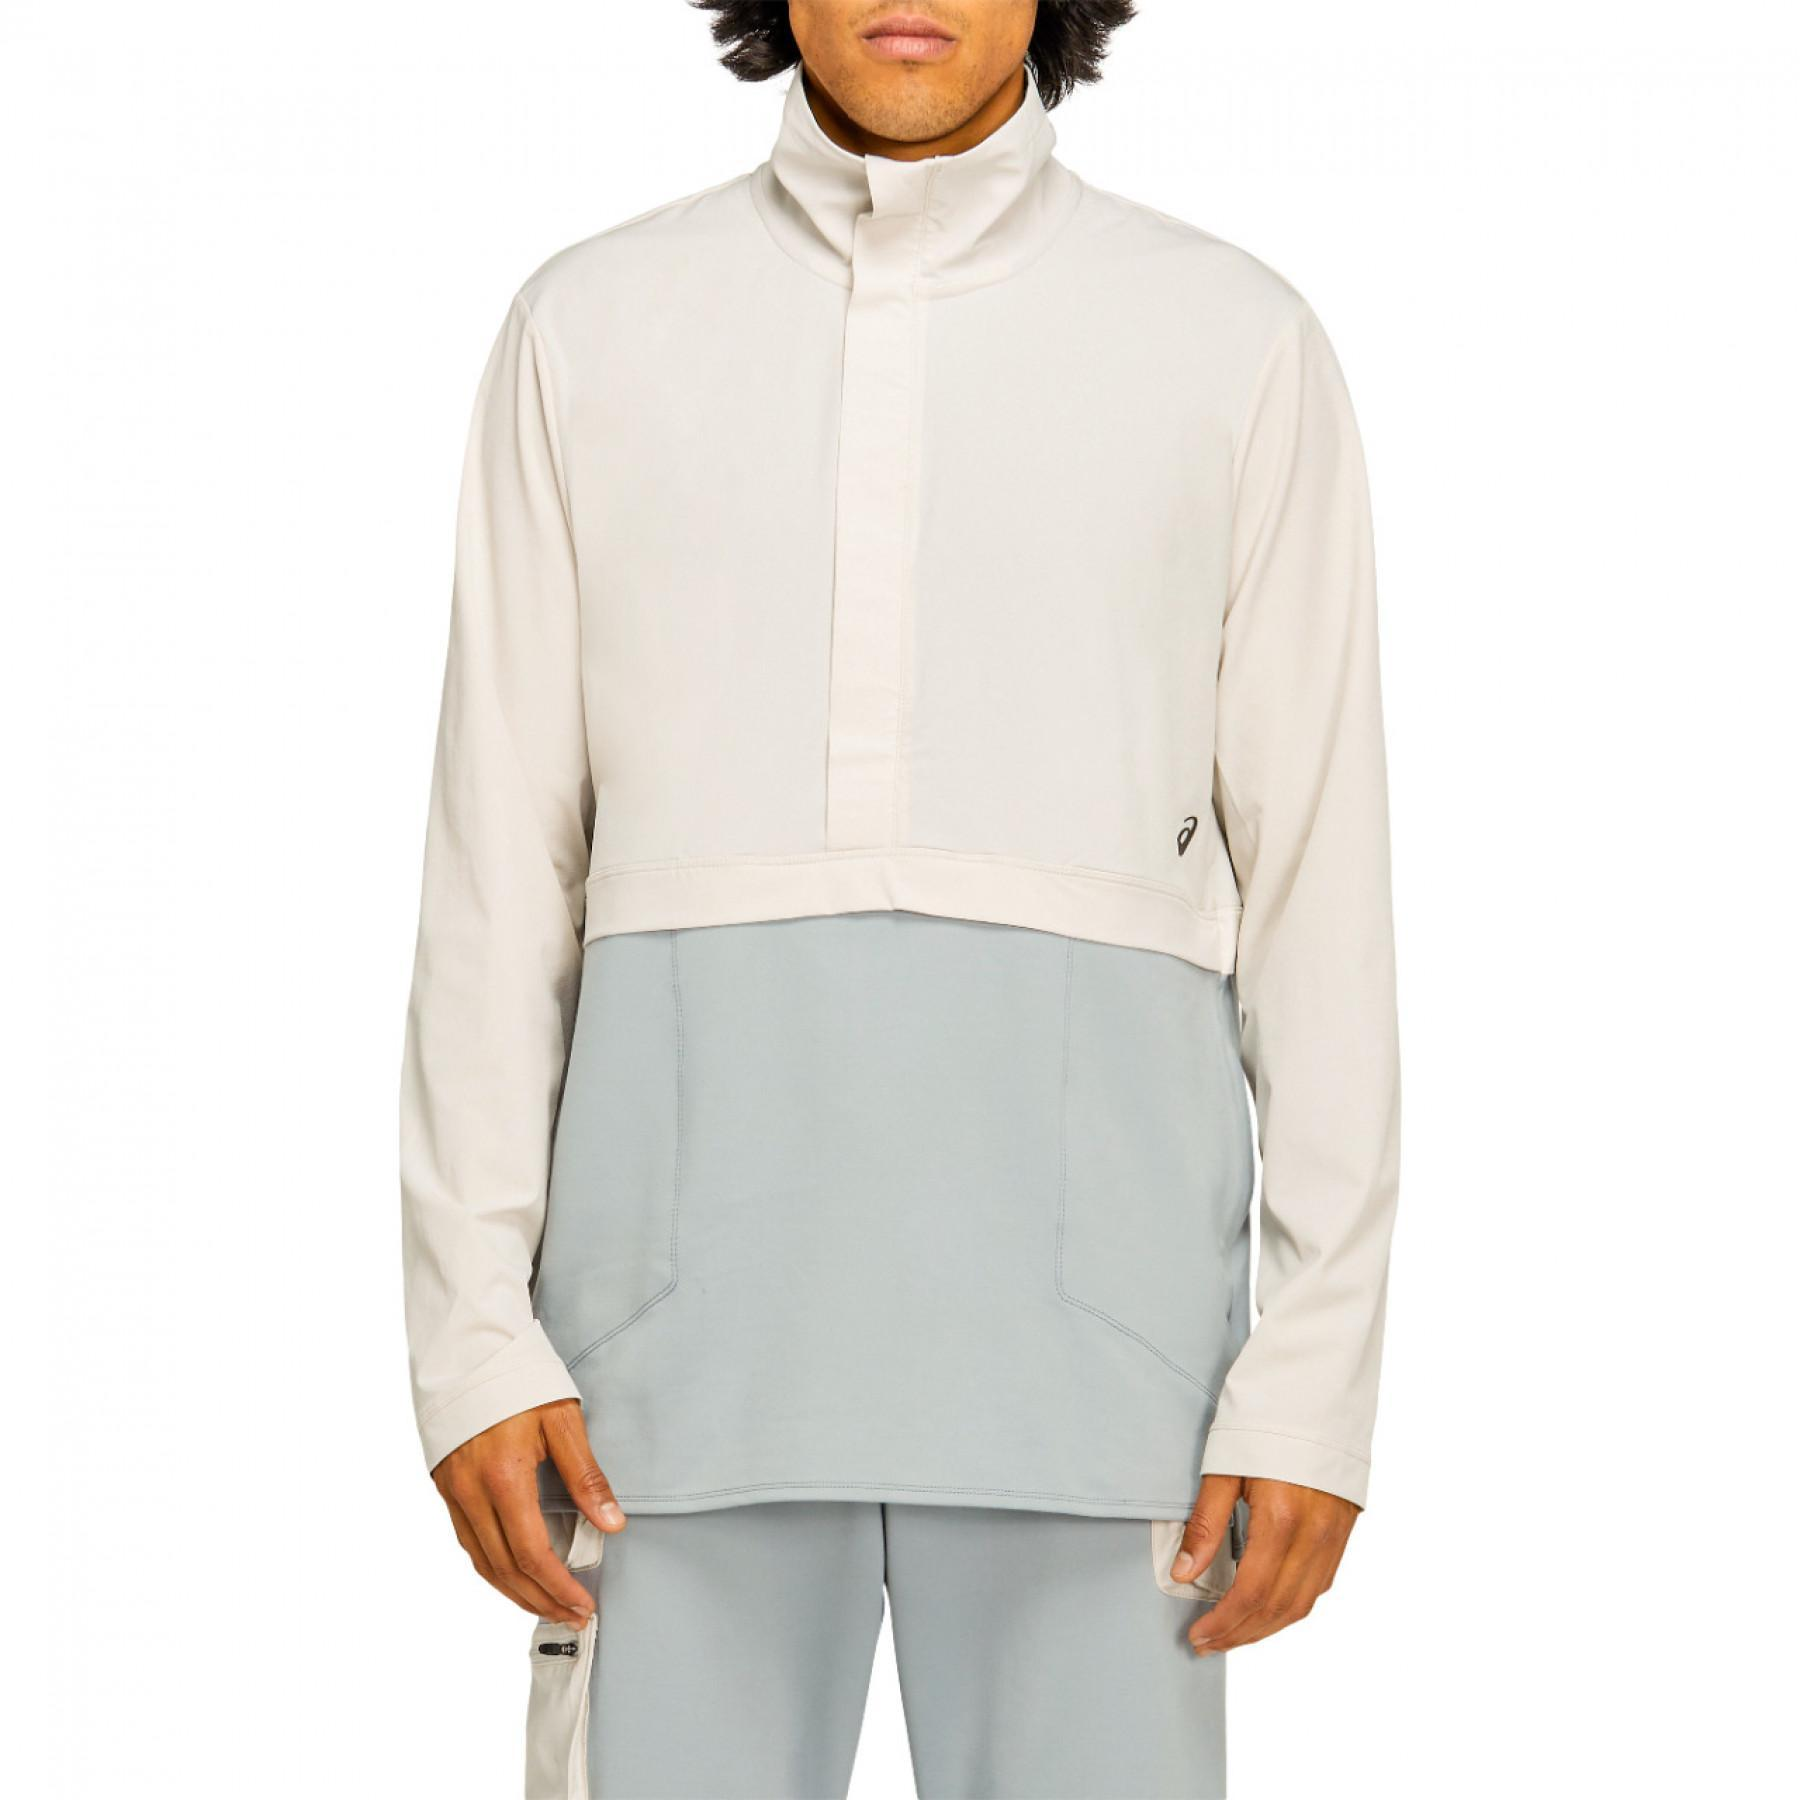 Jacket Asics Thermopolis Hybrid